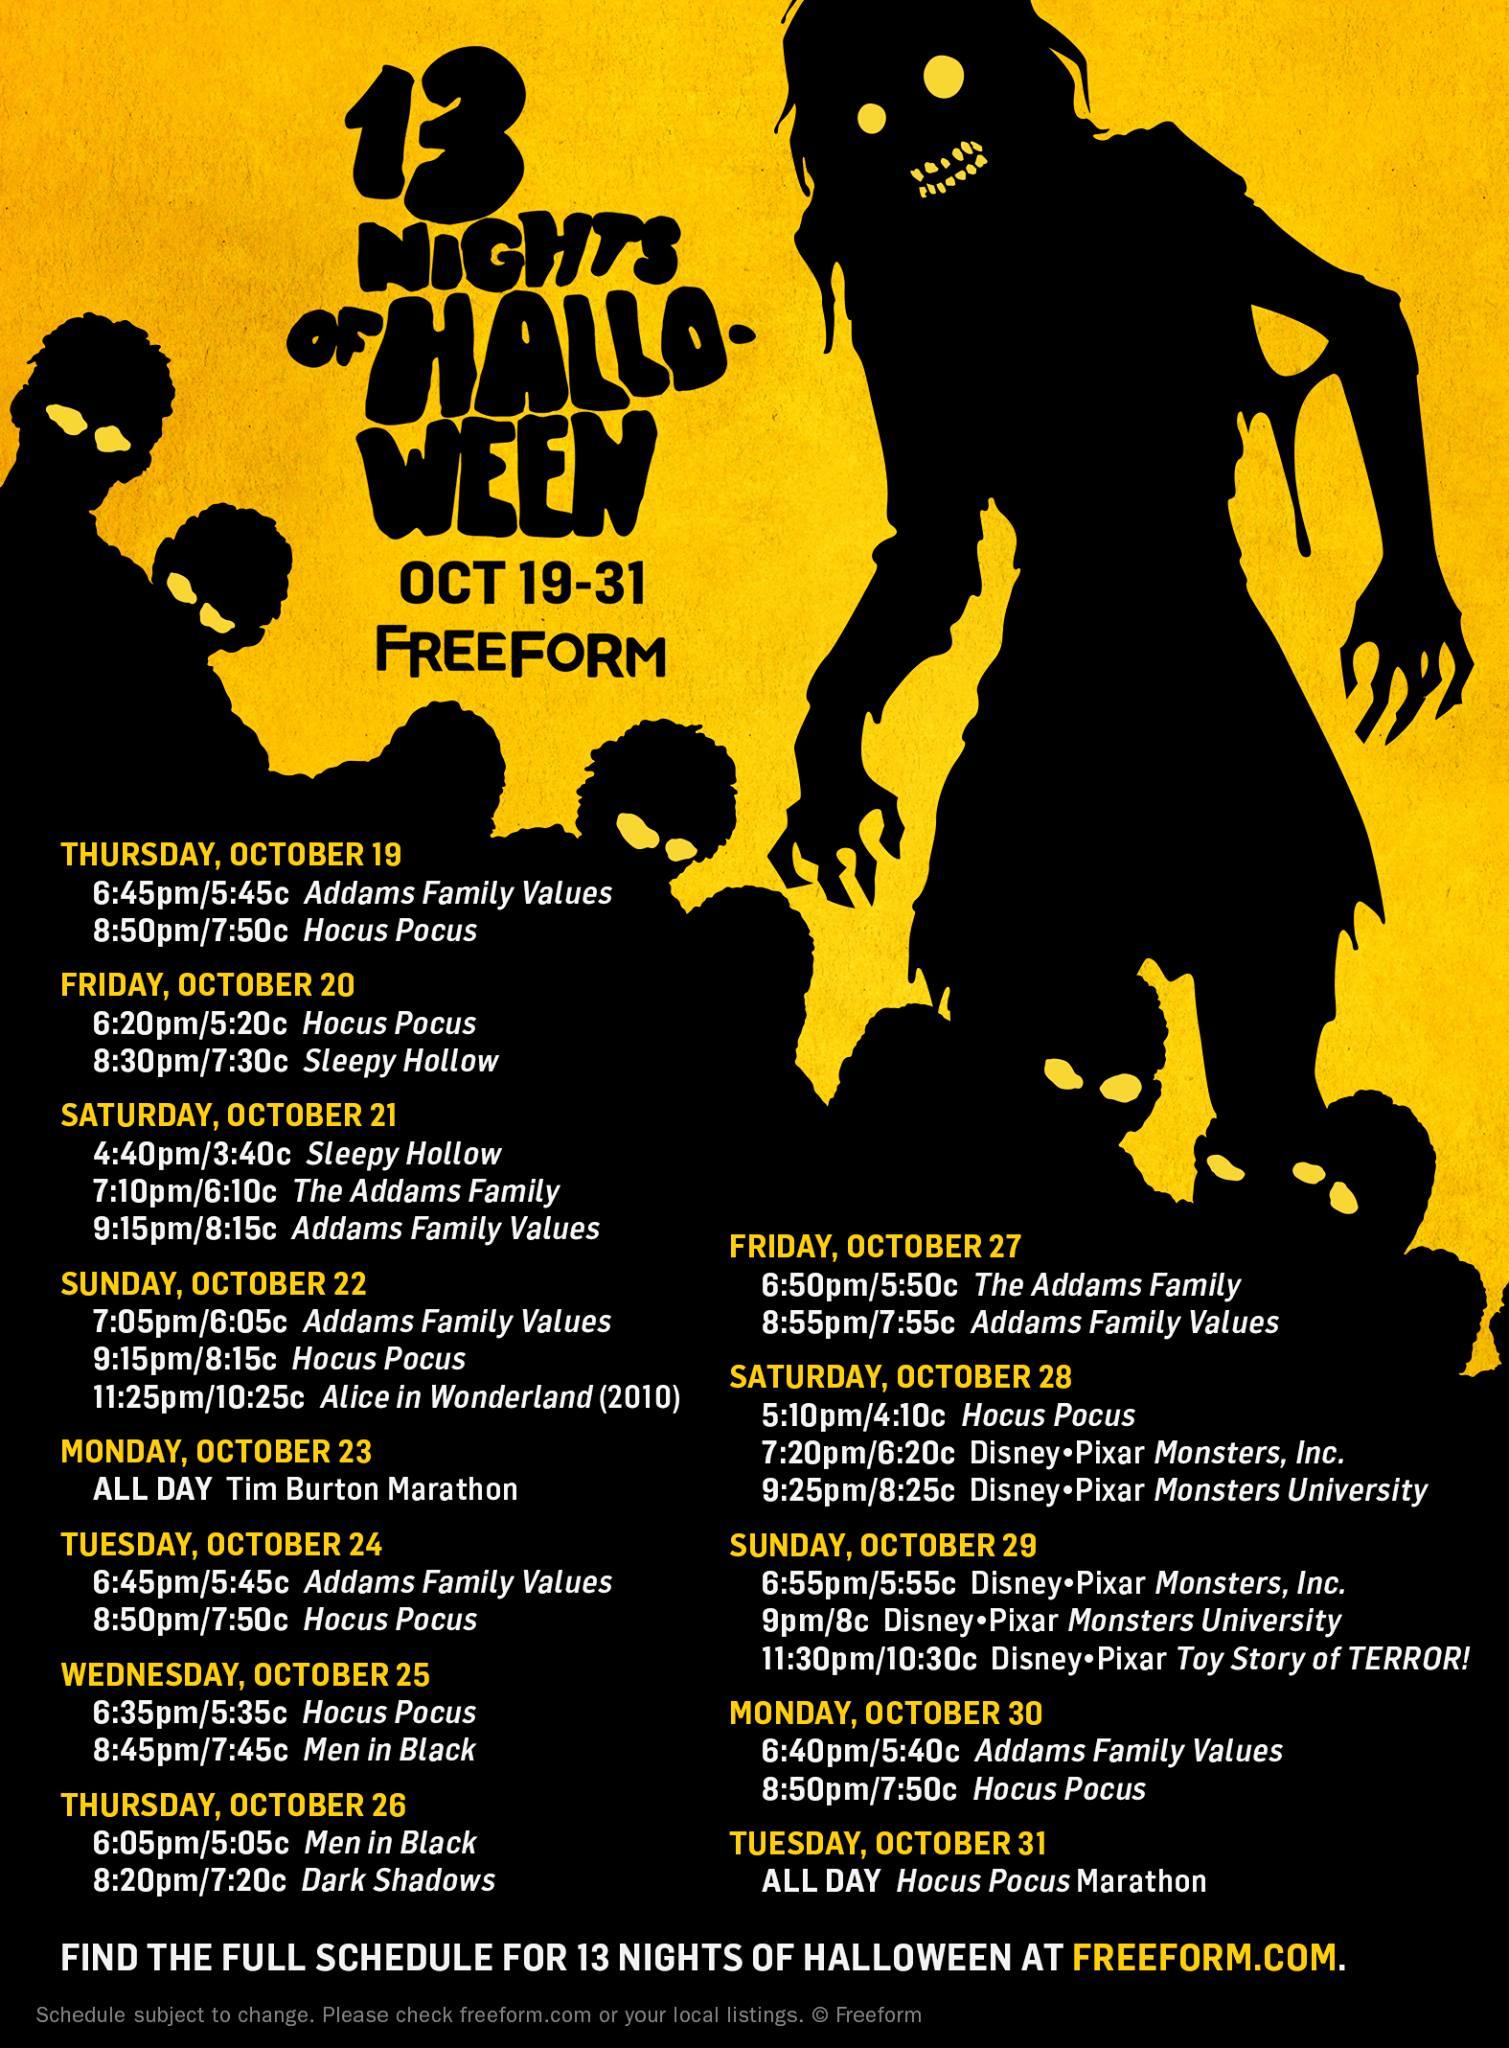 13 nights of halloween 2017 lineup